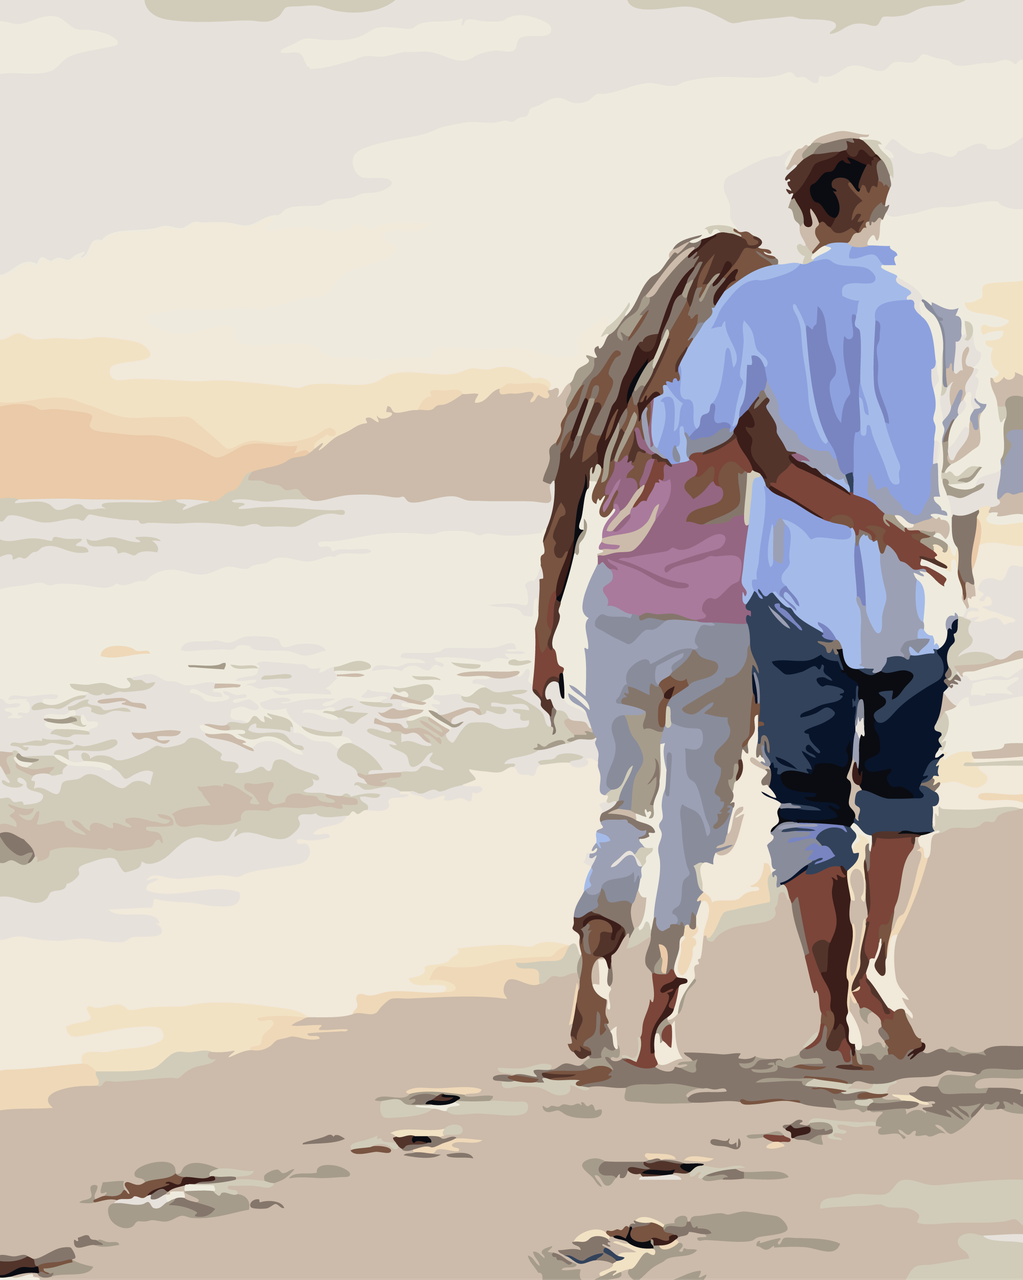 Картина по номерам Прогулка по пляжу, 40x50 см., Art Story